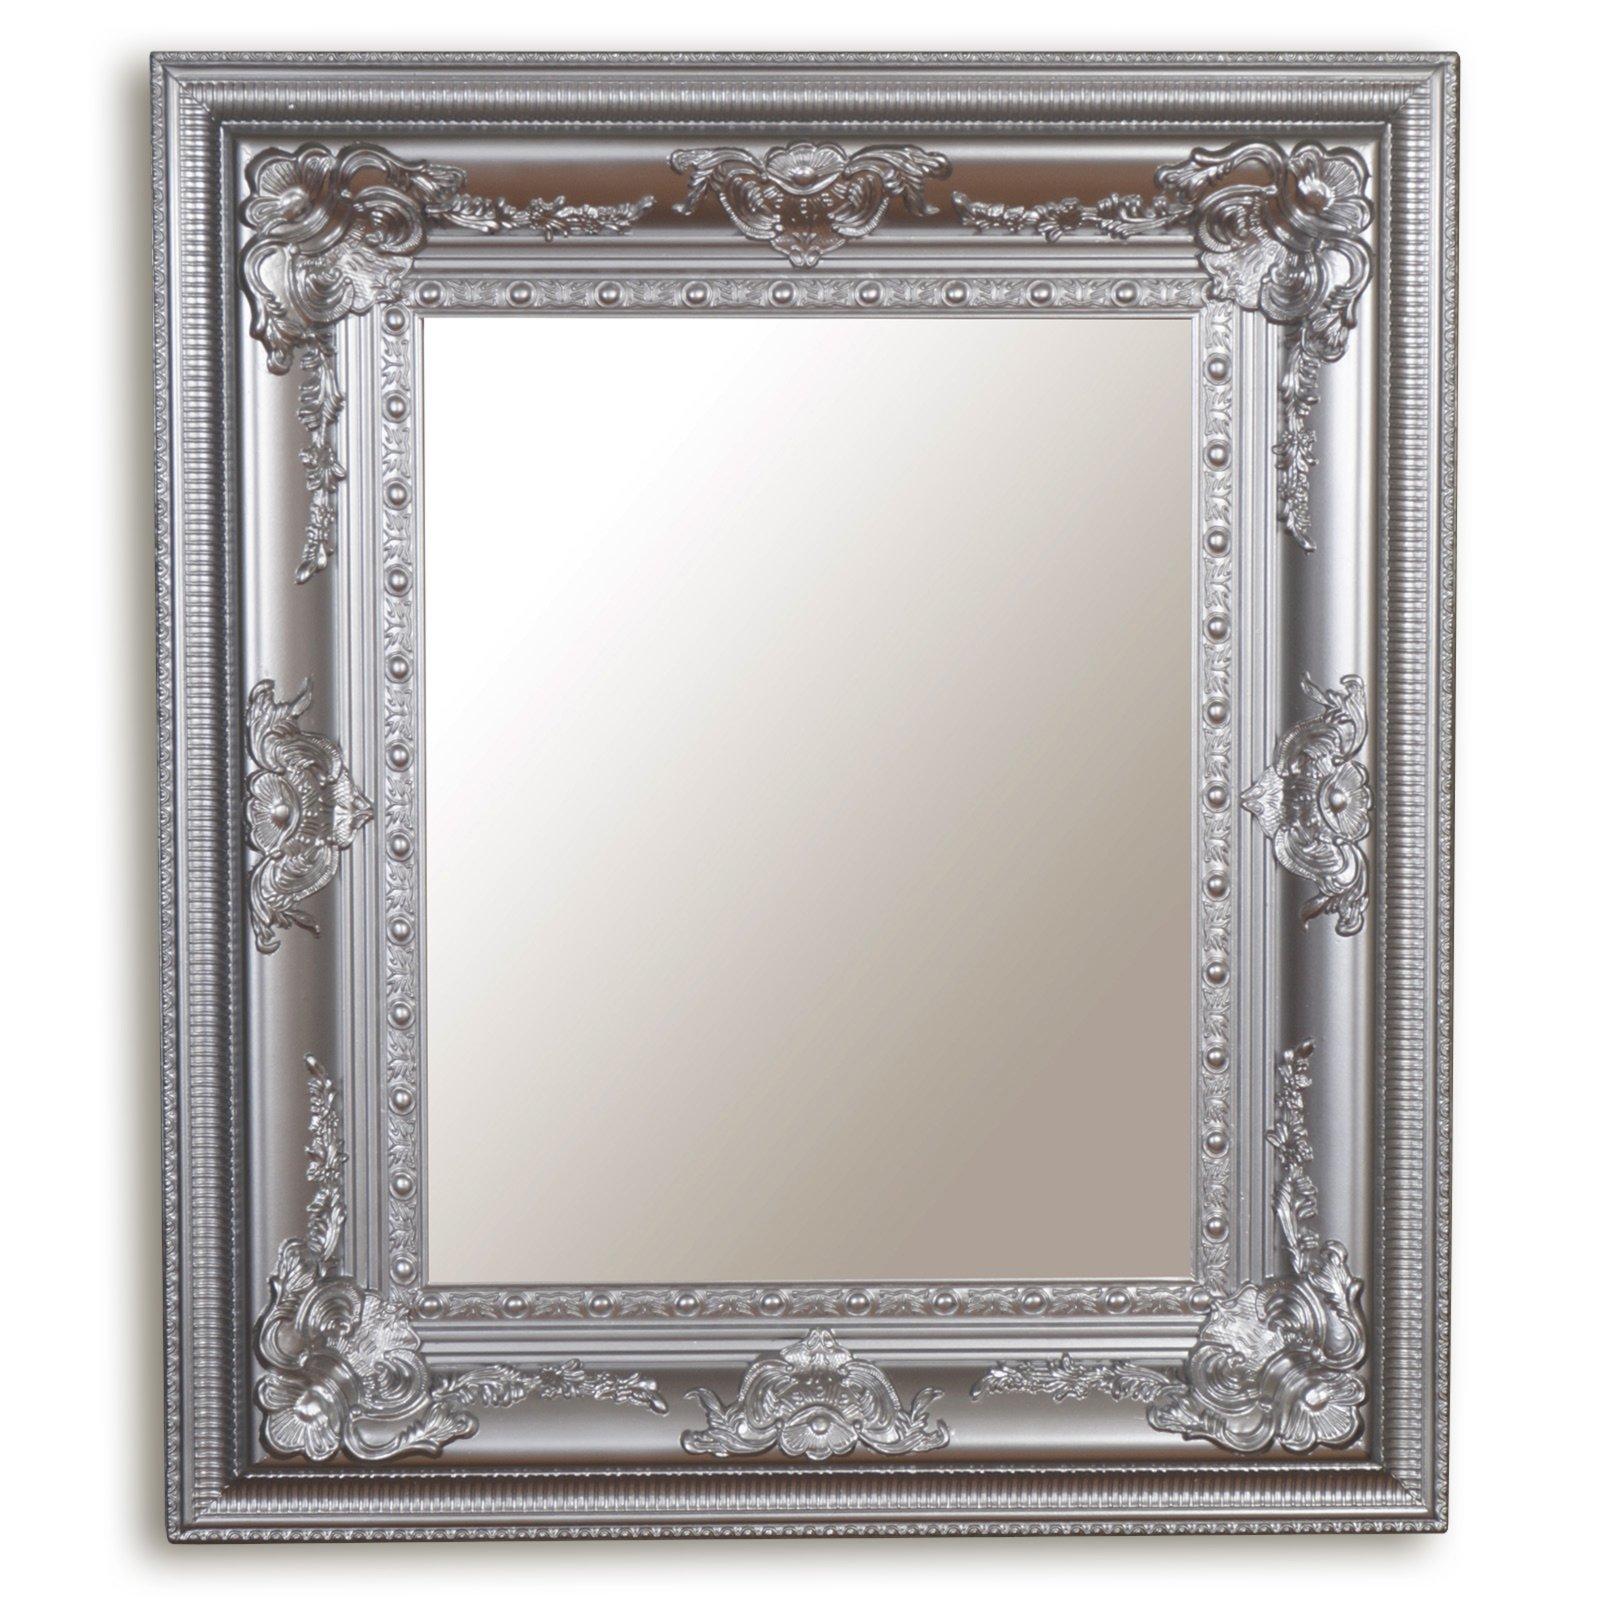 wandspiegel silber holz wandspiegel spiegel deko haushalt roller. Black Bedroom Furniture Sets. Home Design Ideas